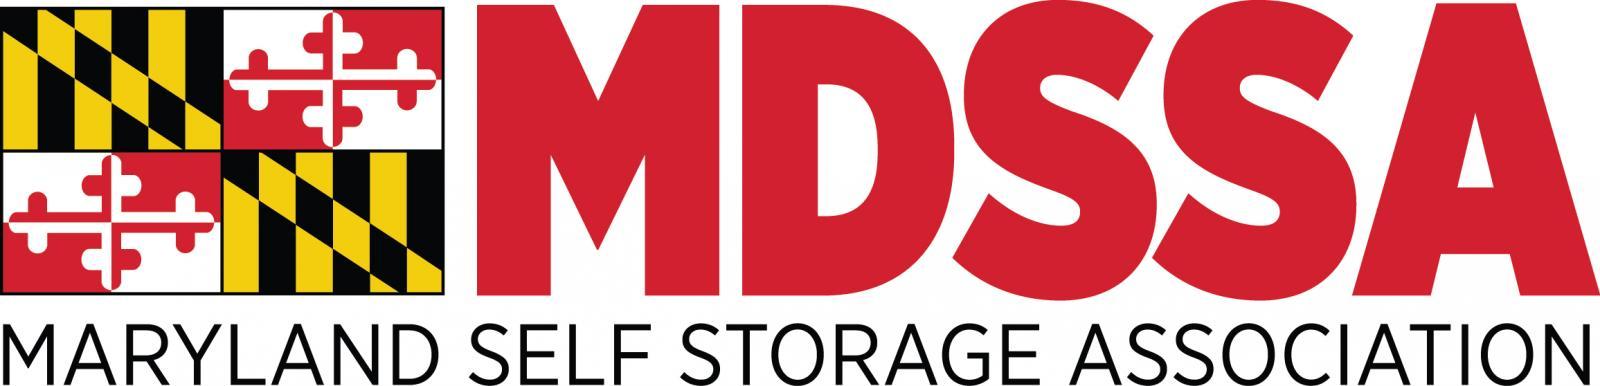 Maryland Self Storage Association Logo